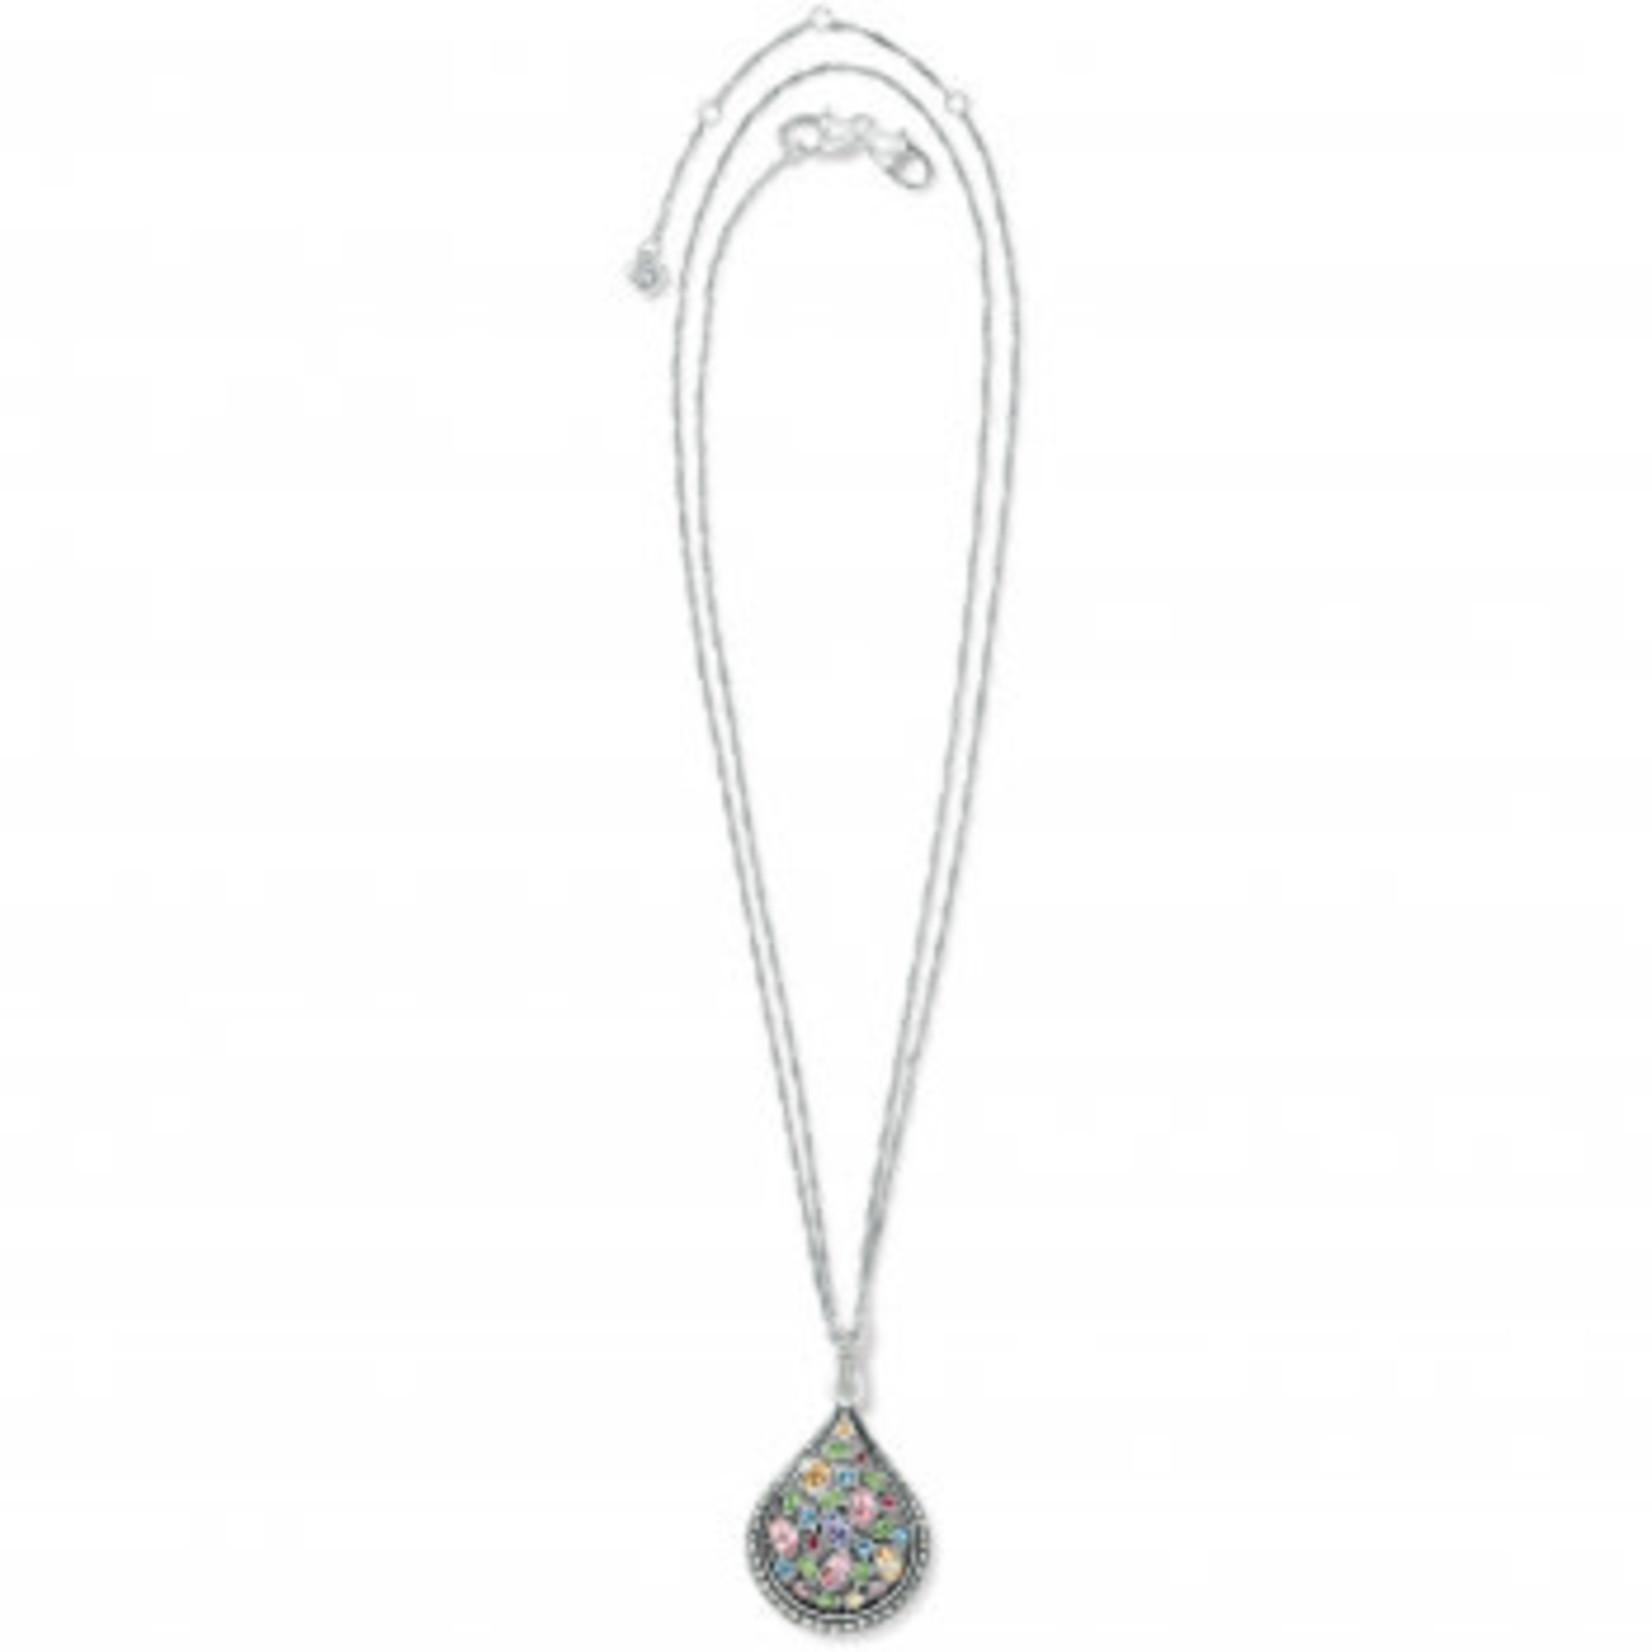 Brighton Trust Your Journey Convertible Drop Necklace